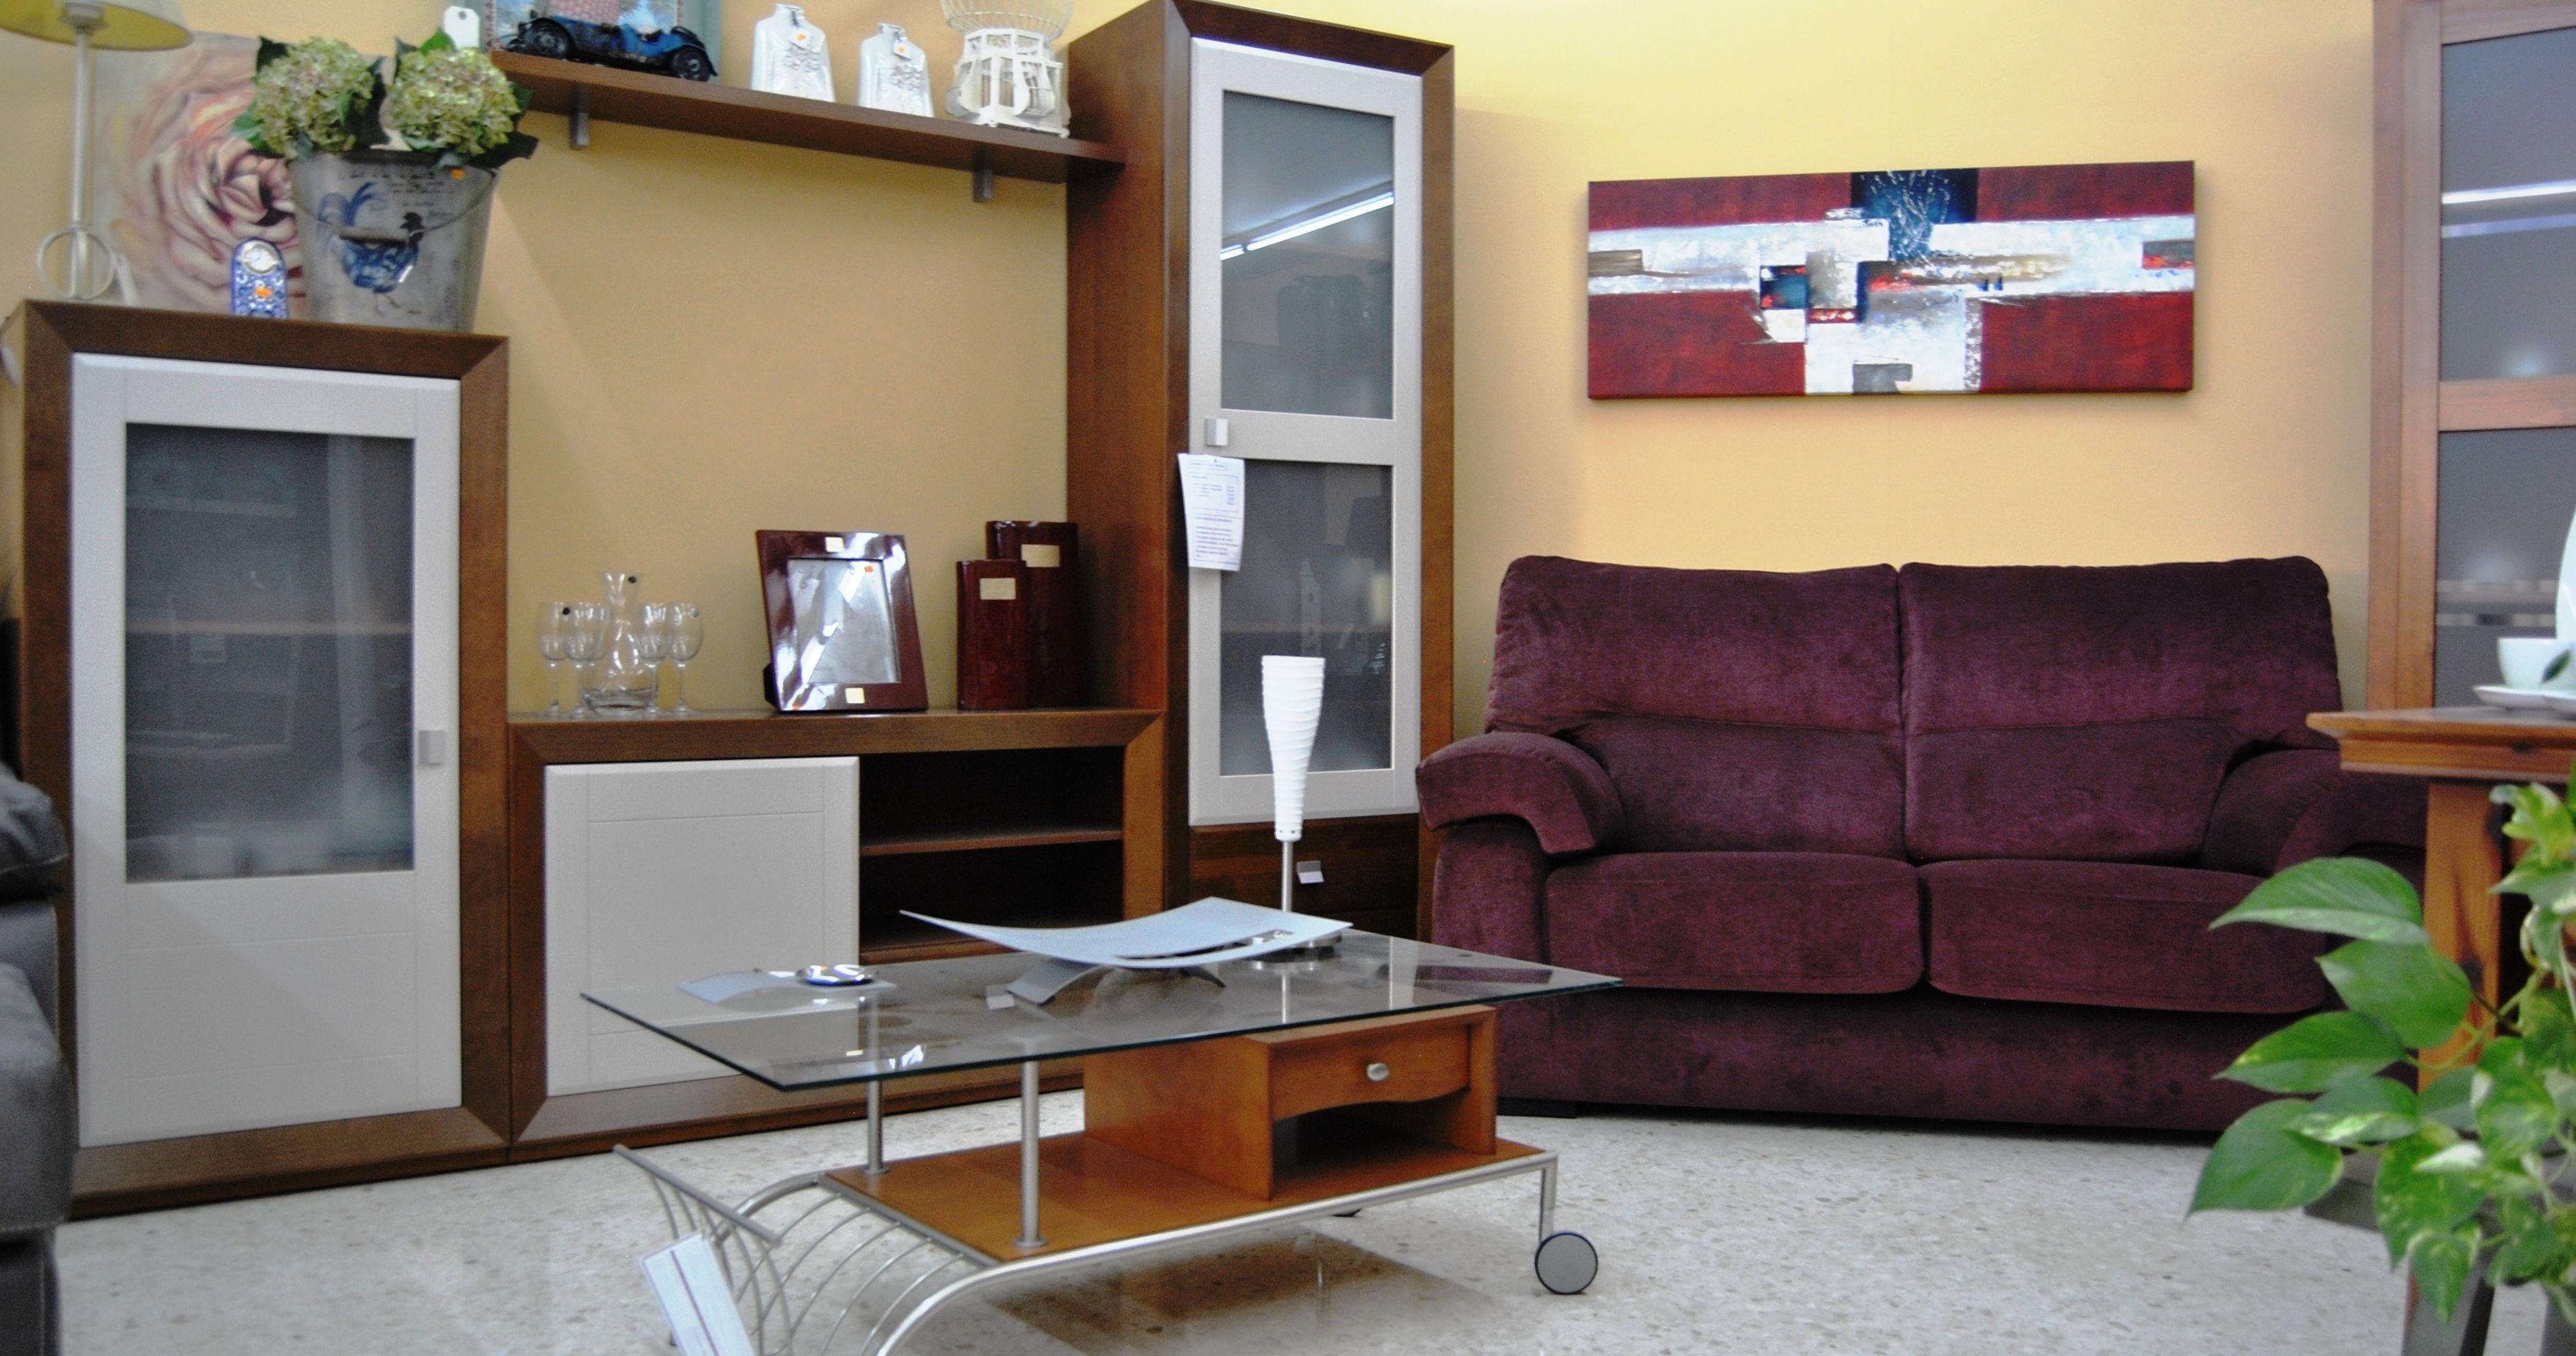 Muebles en sevilla muebles isidoro dom nguez bellavista for Muebles juveniles sevilla